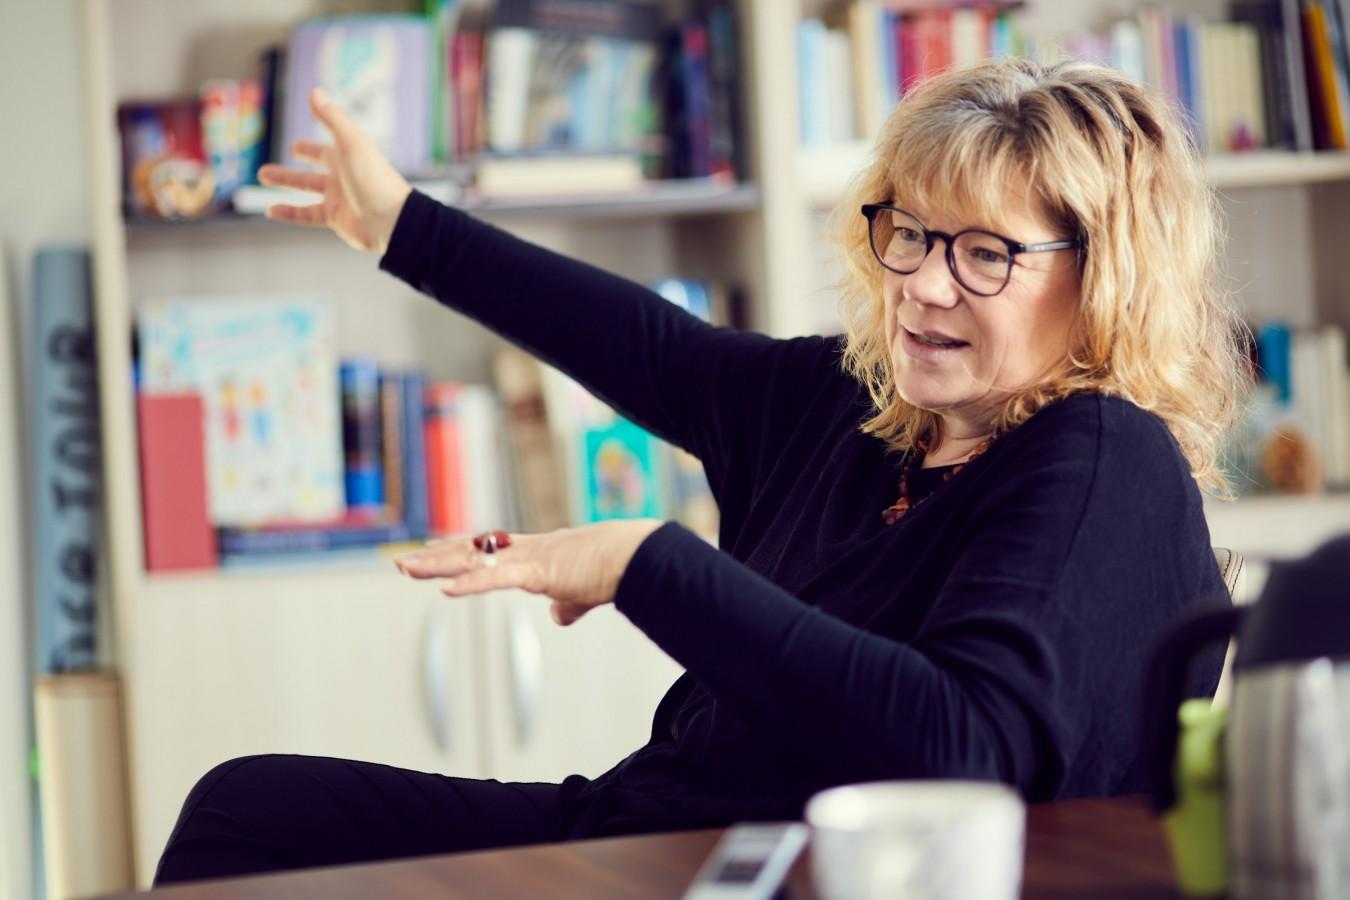 Interview with Felicitas Loewe by Nikolaus Brade.